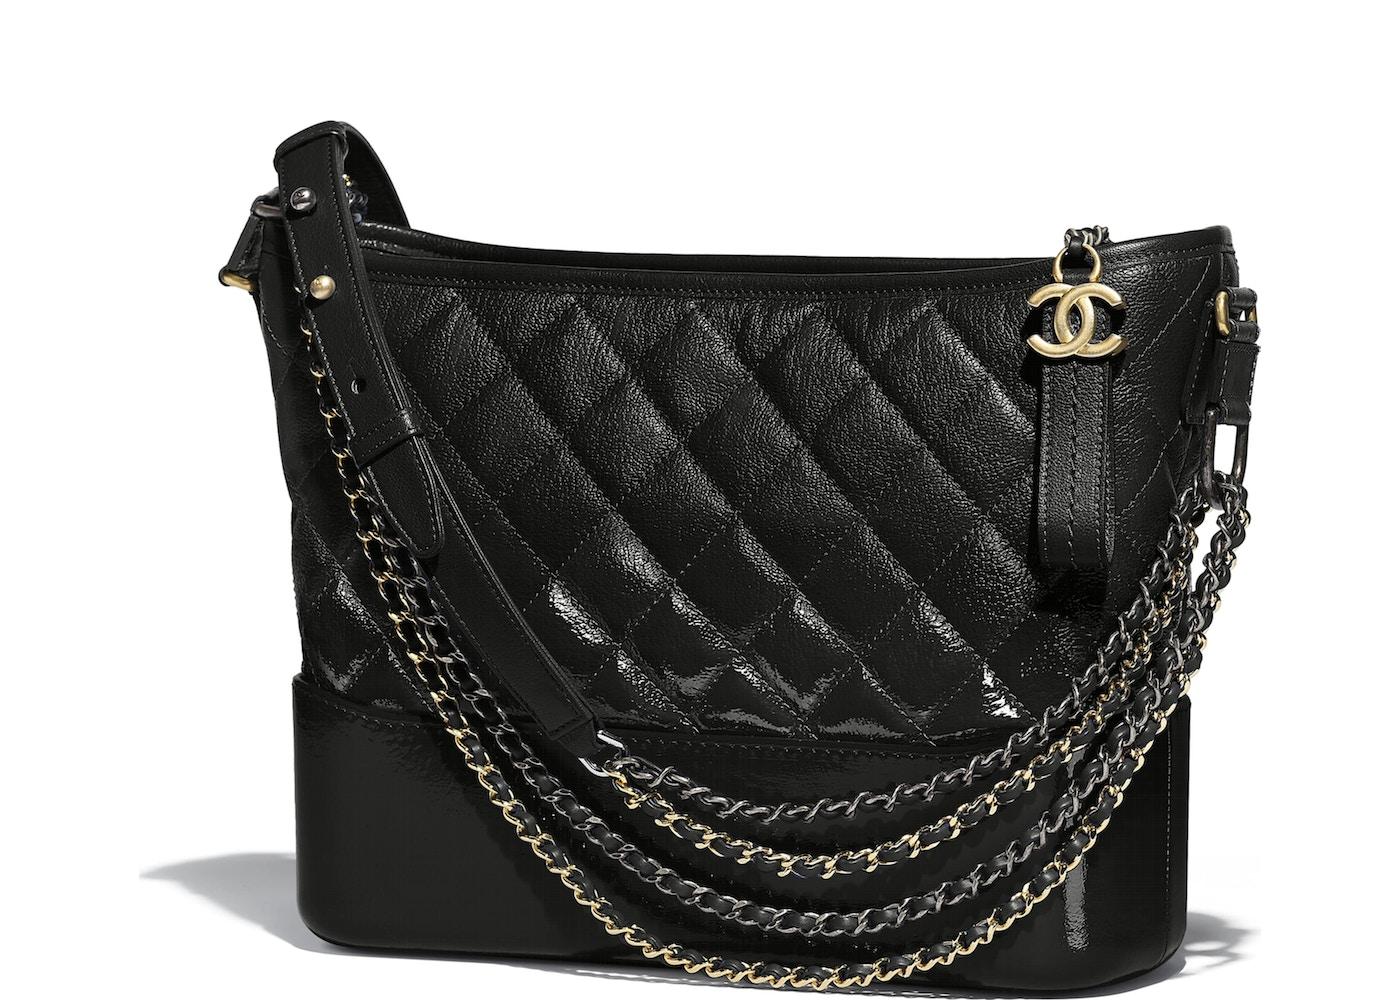 c52bb931be1eb0 Chanel Gabrielle Hobo Bag Black. Black